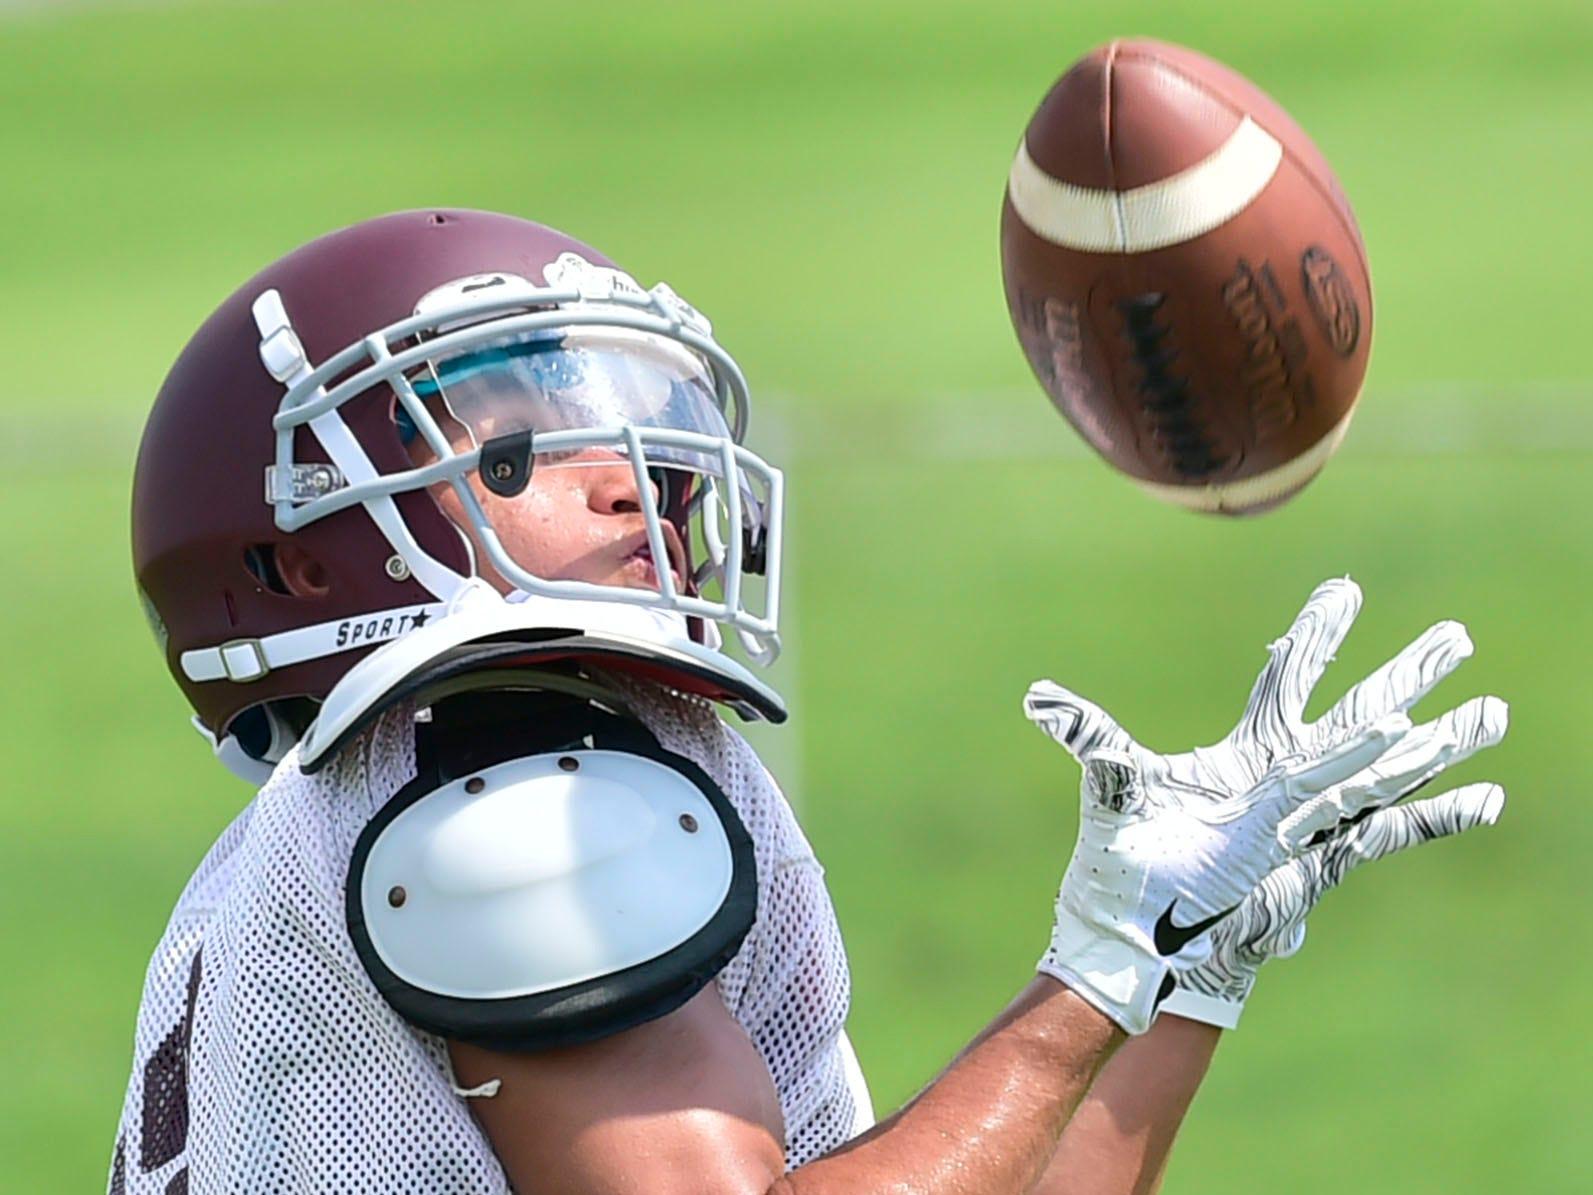 Shippensburg's Christian Melendez hauls in a pass. Shippensburg High School football players practice on Thursday, August 9, 2018.